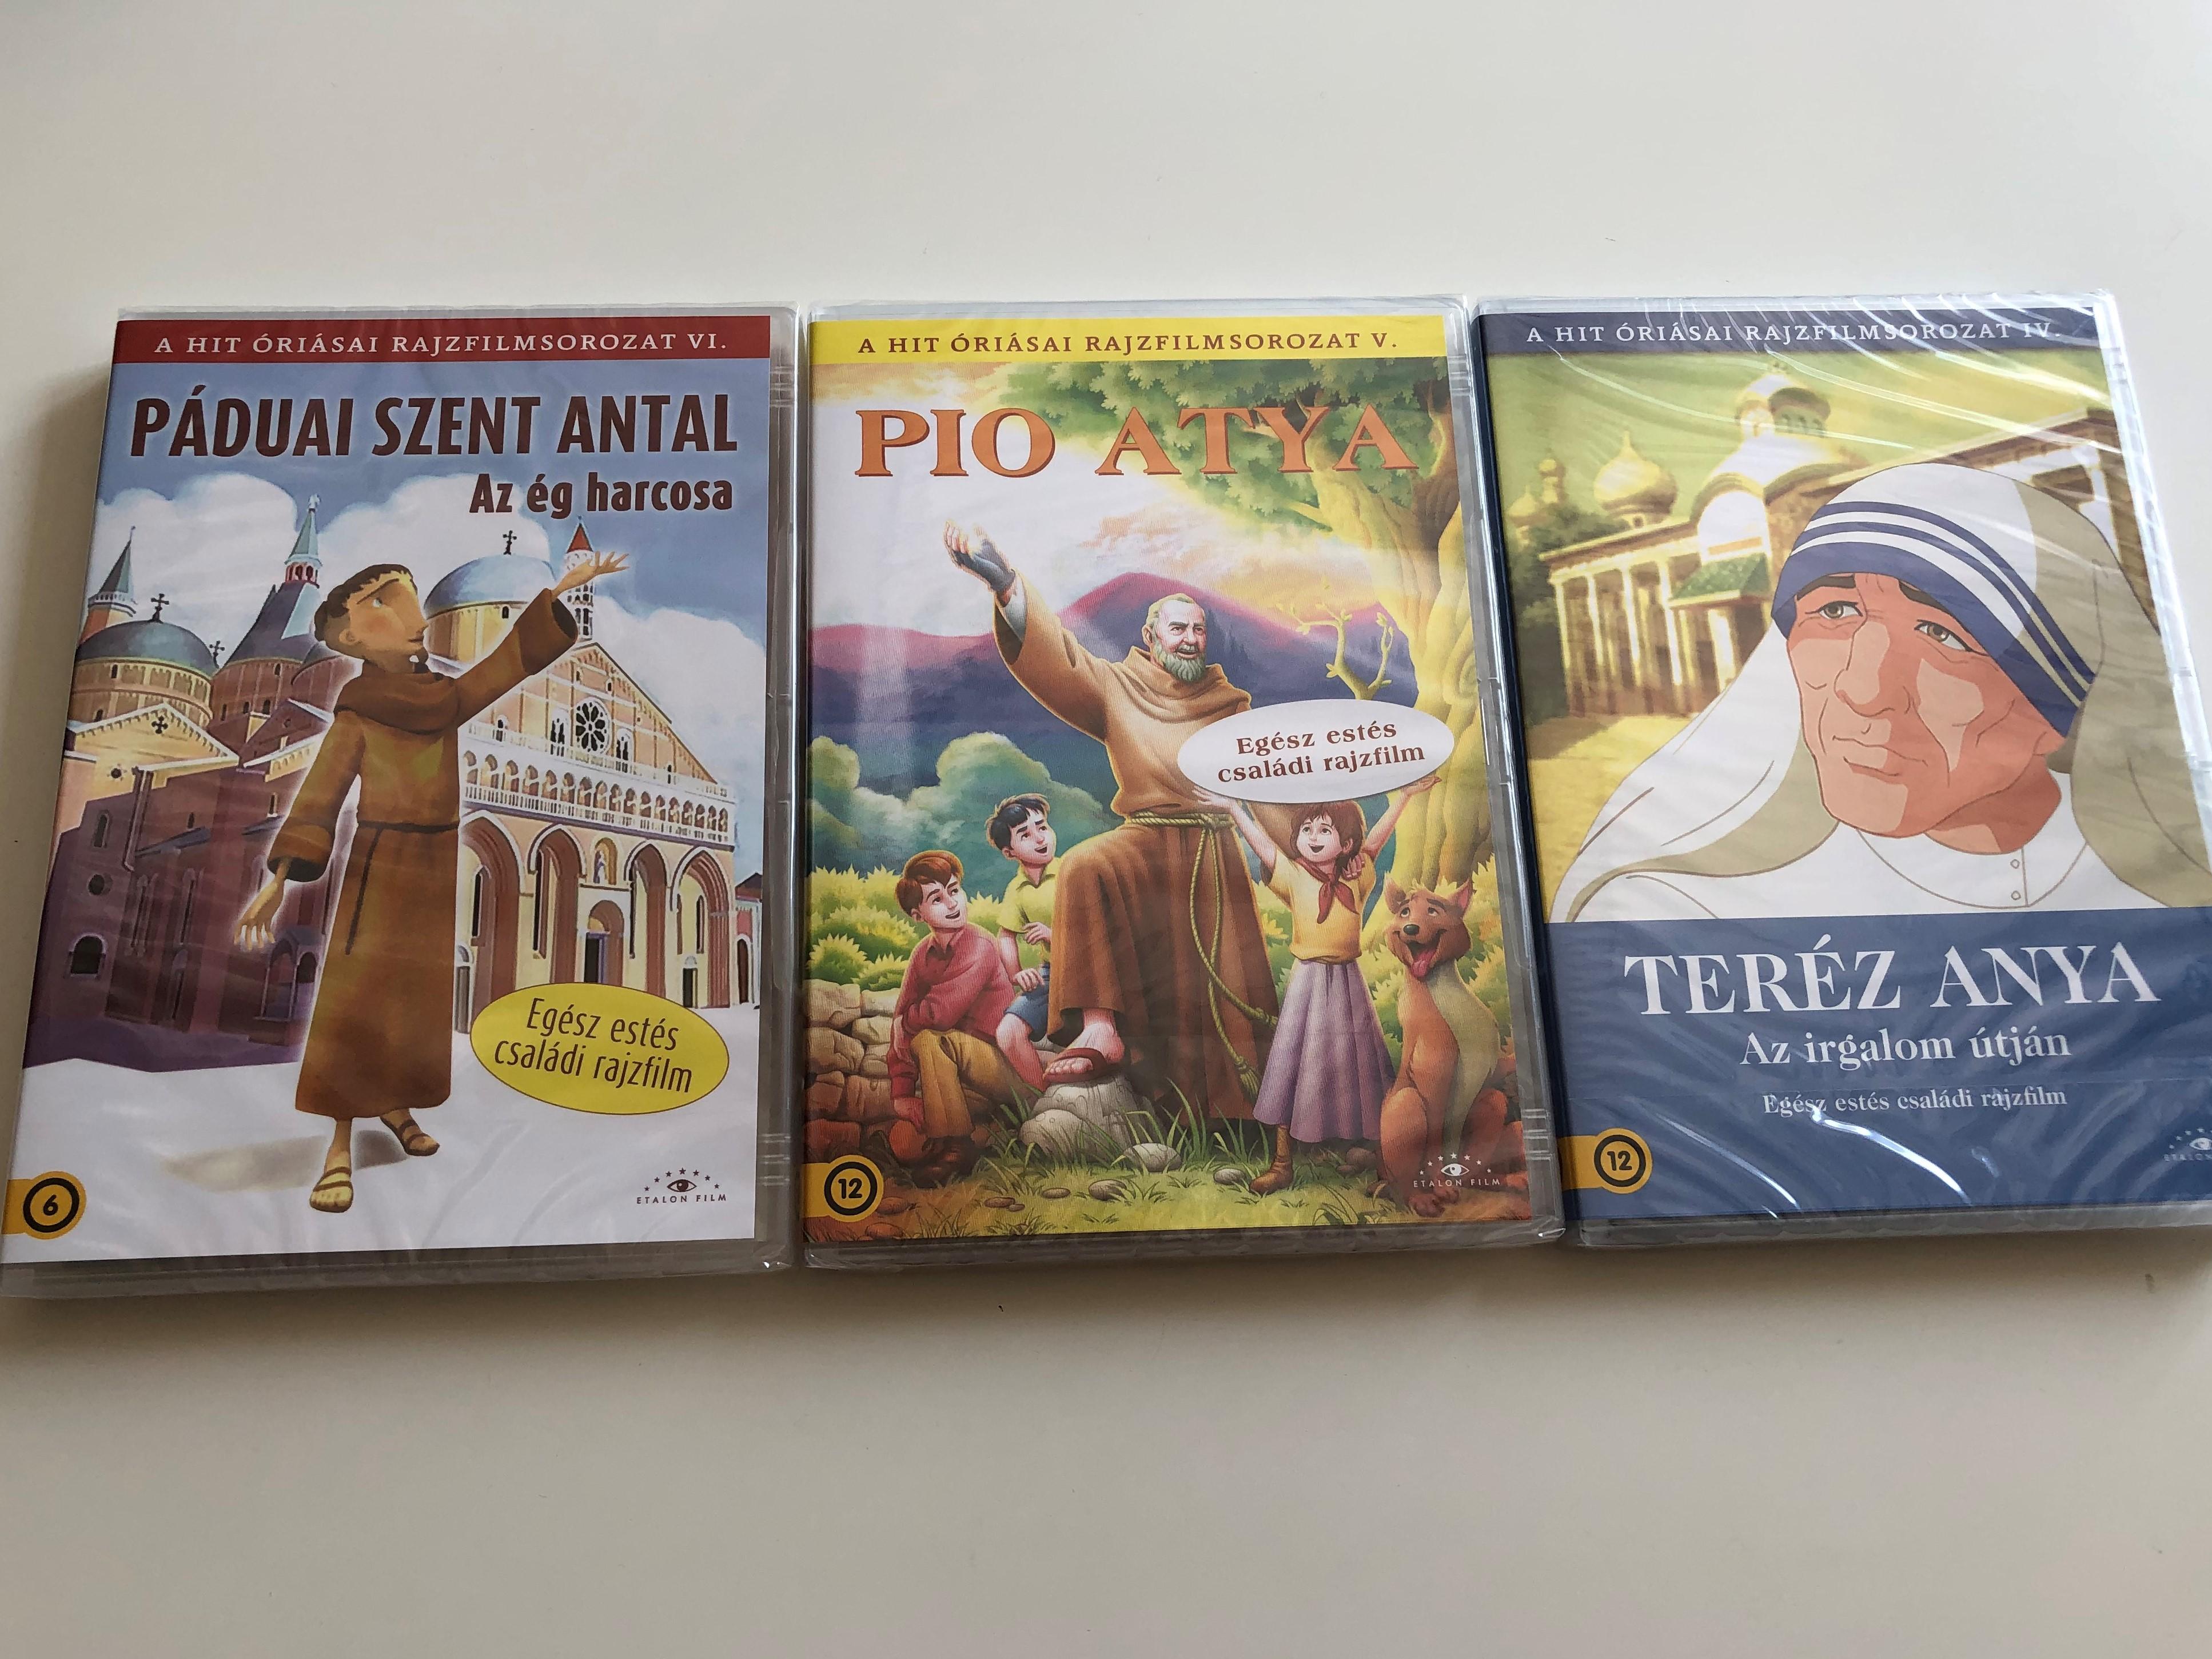 p-duai-szent-antal-pio-atya-ter-z-anya-dvd-a-hit-ri-sai-rajzfilmsorozat-ii-3-disc-dvd-box-three-family-cartoons-synchronised-to-hungarian-language-7-.jpg